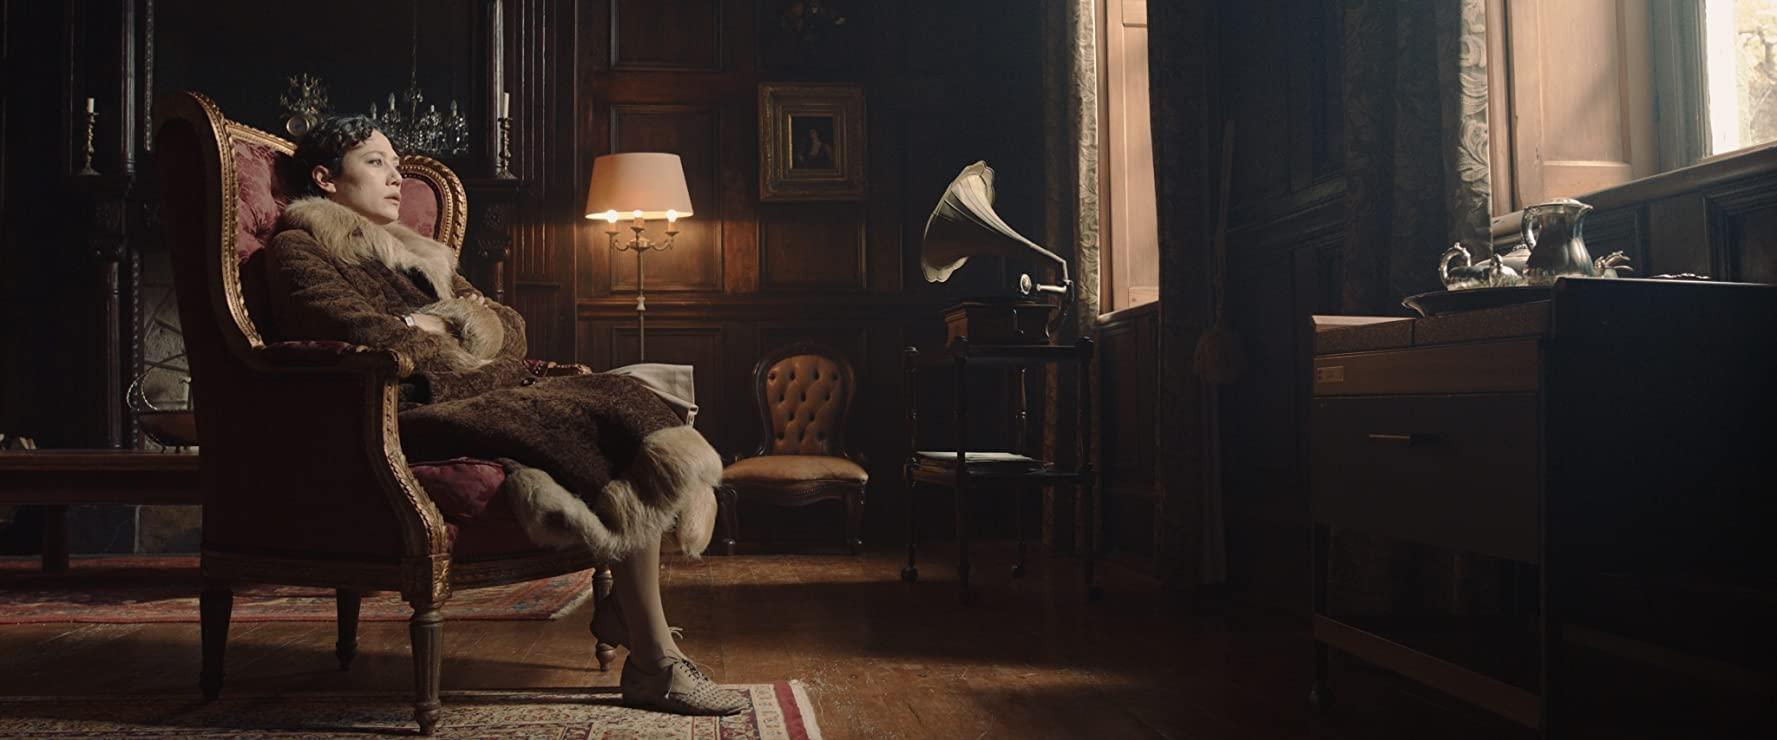 مشاهدة فيلم 8 A South African Horror Story (2019) مترجم HD اون لاين